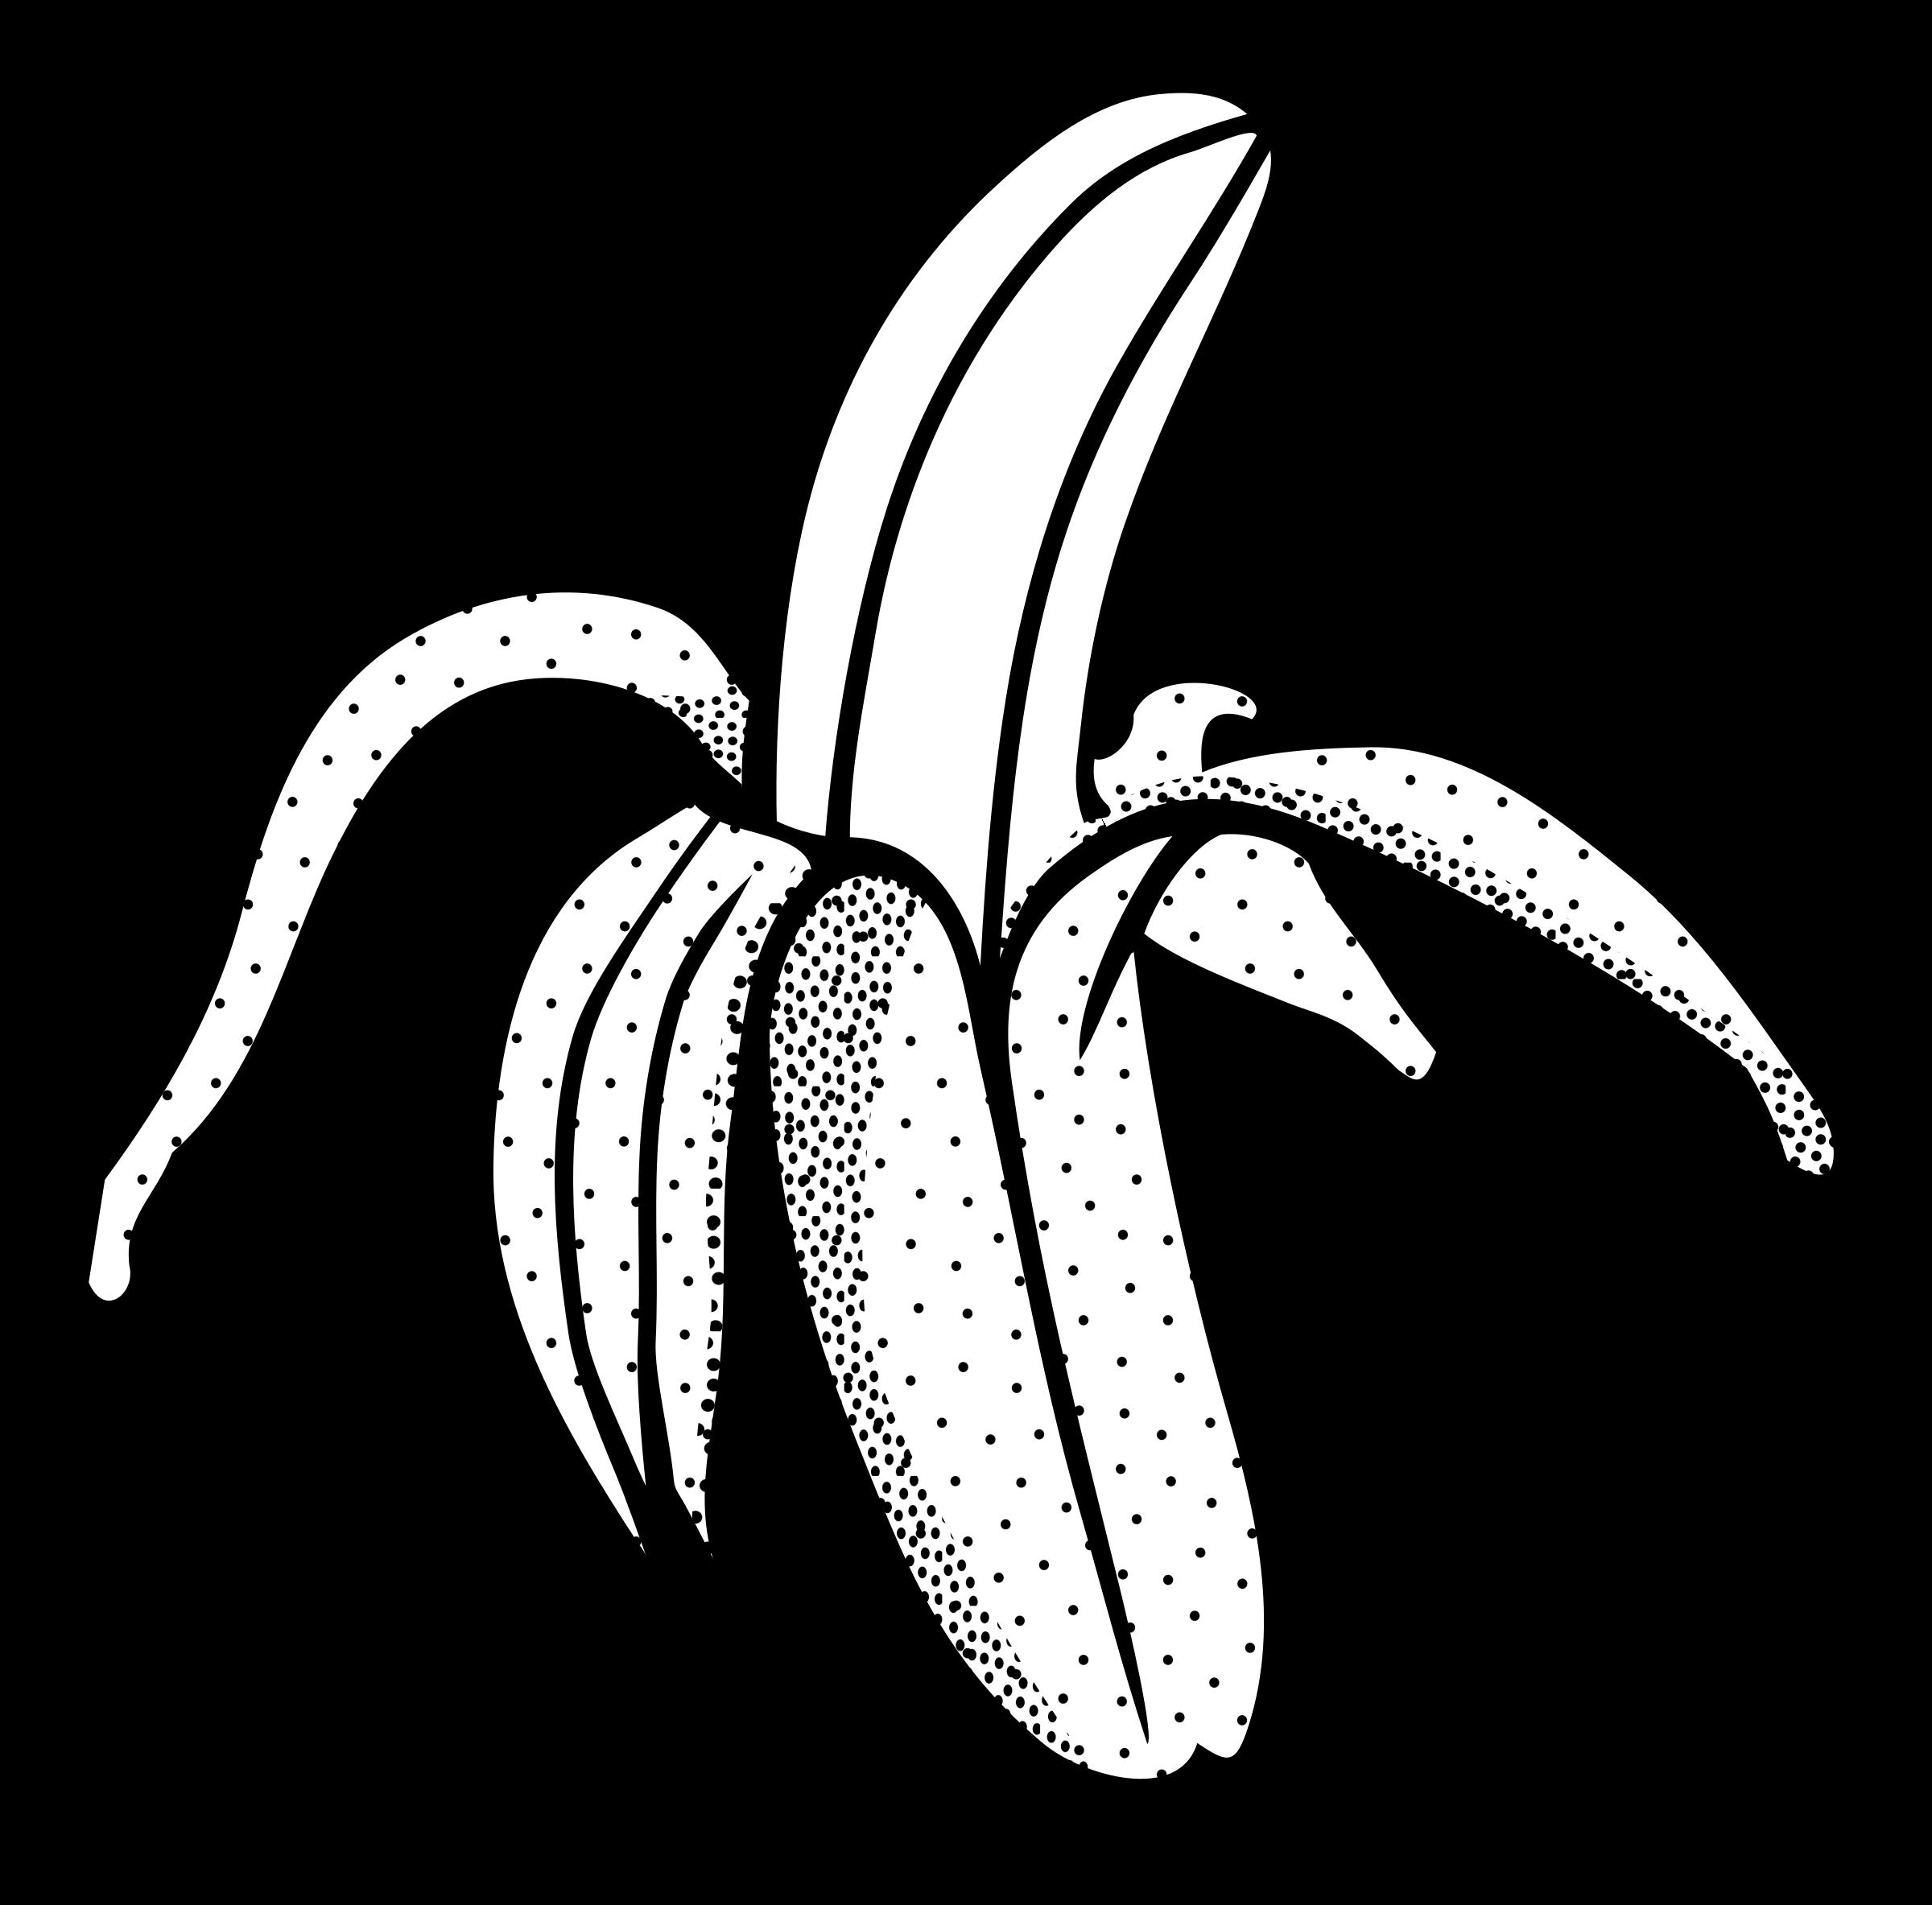 Snake clipart bitmap. Banana lineart icons png